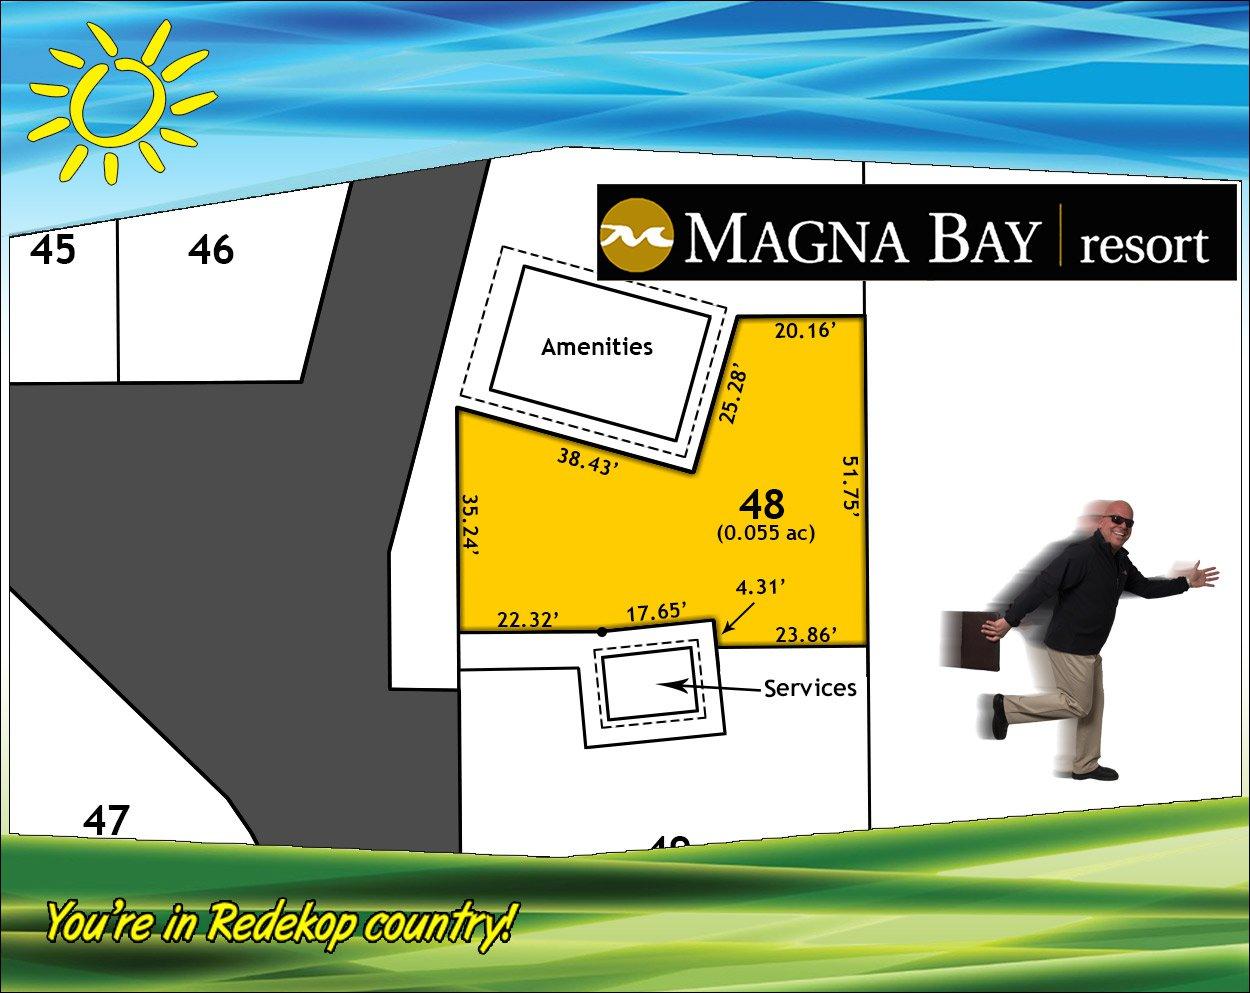 #48 - 6853 Squilax Anglemont Hwy - Magna Bay Resort